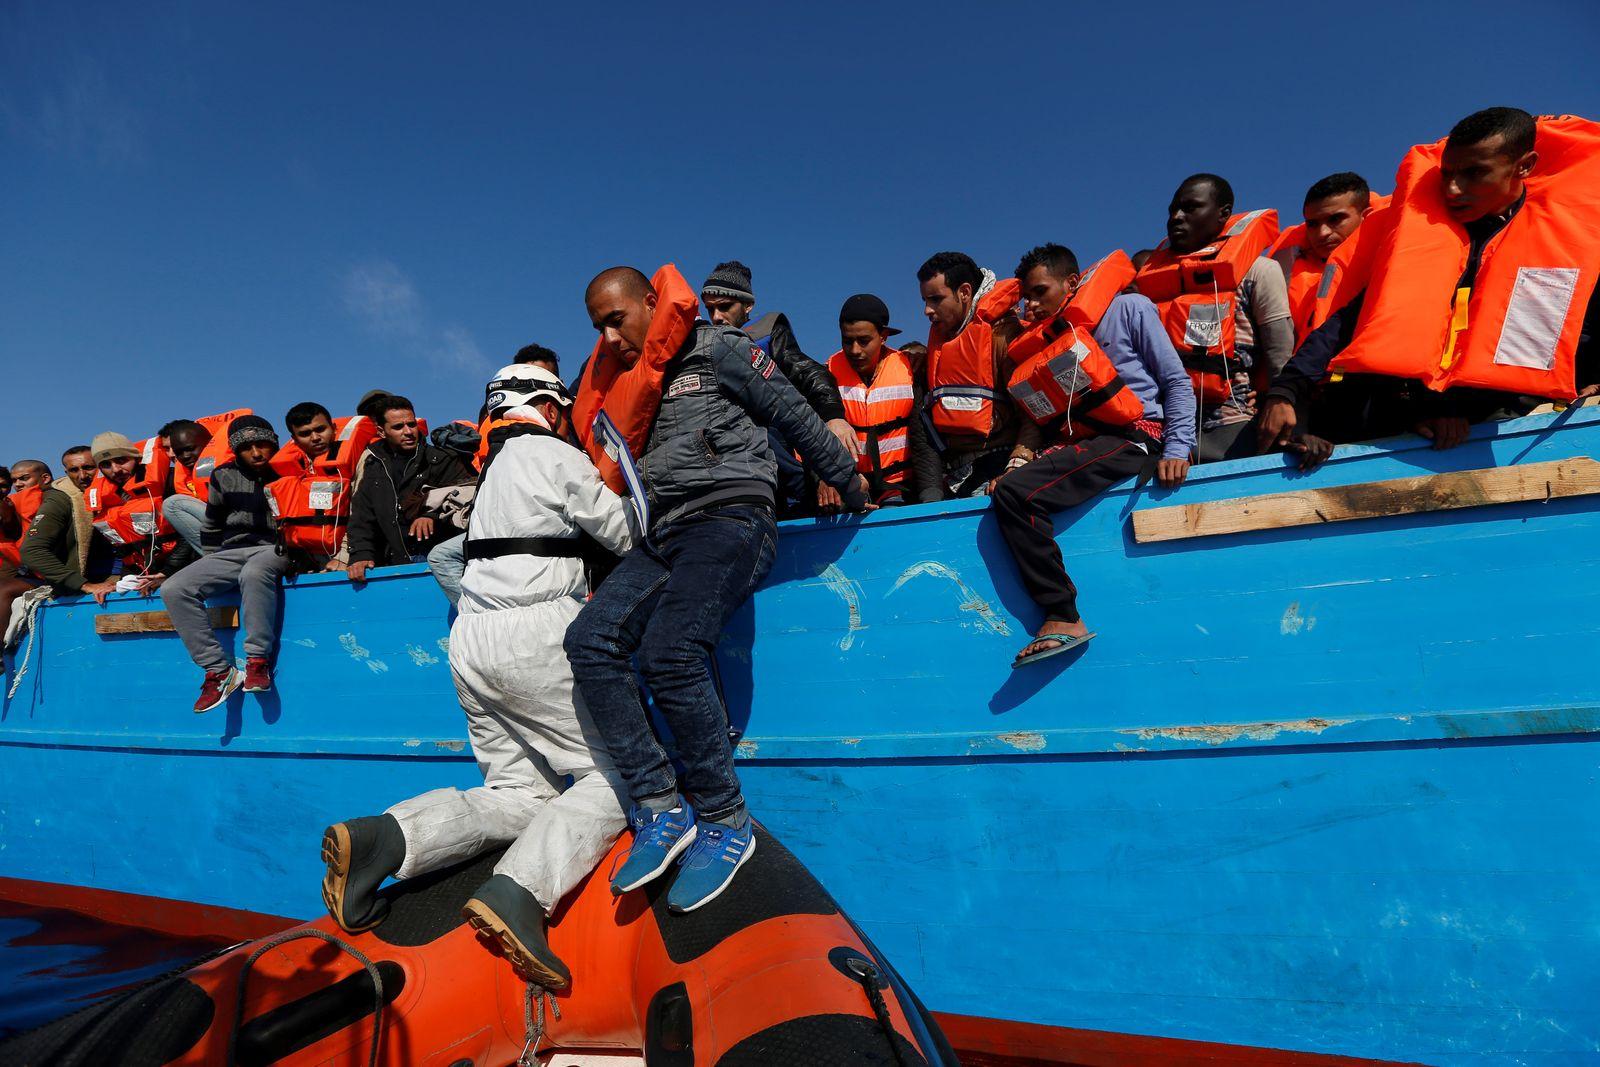 Libyen/ Flüchtlinge/ Hilfe